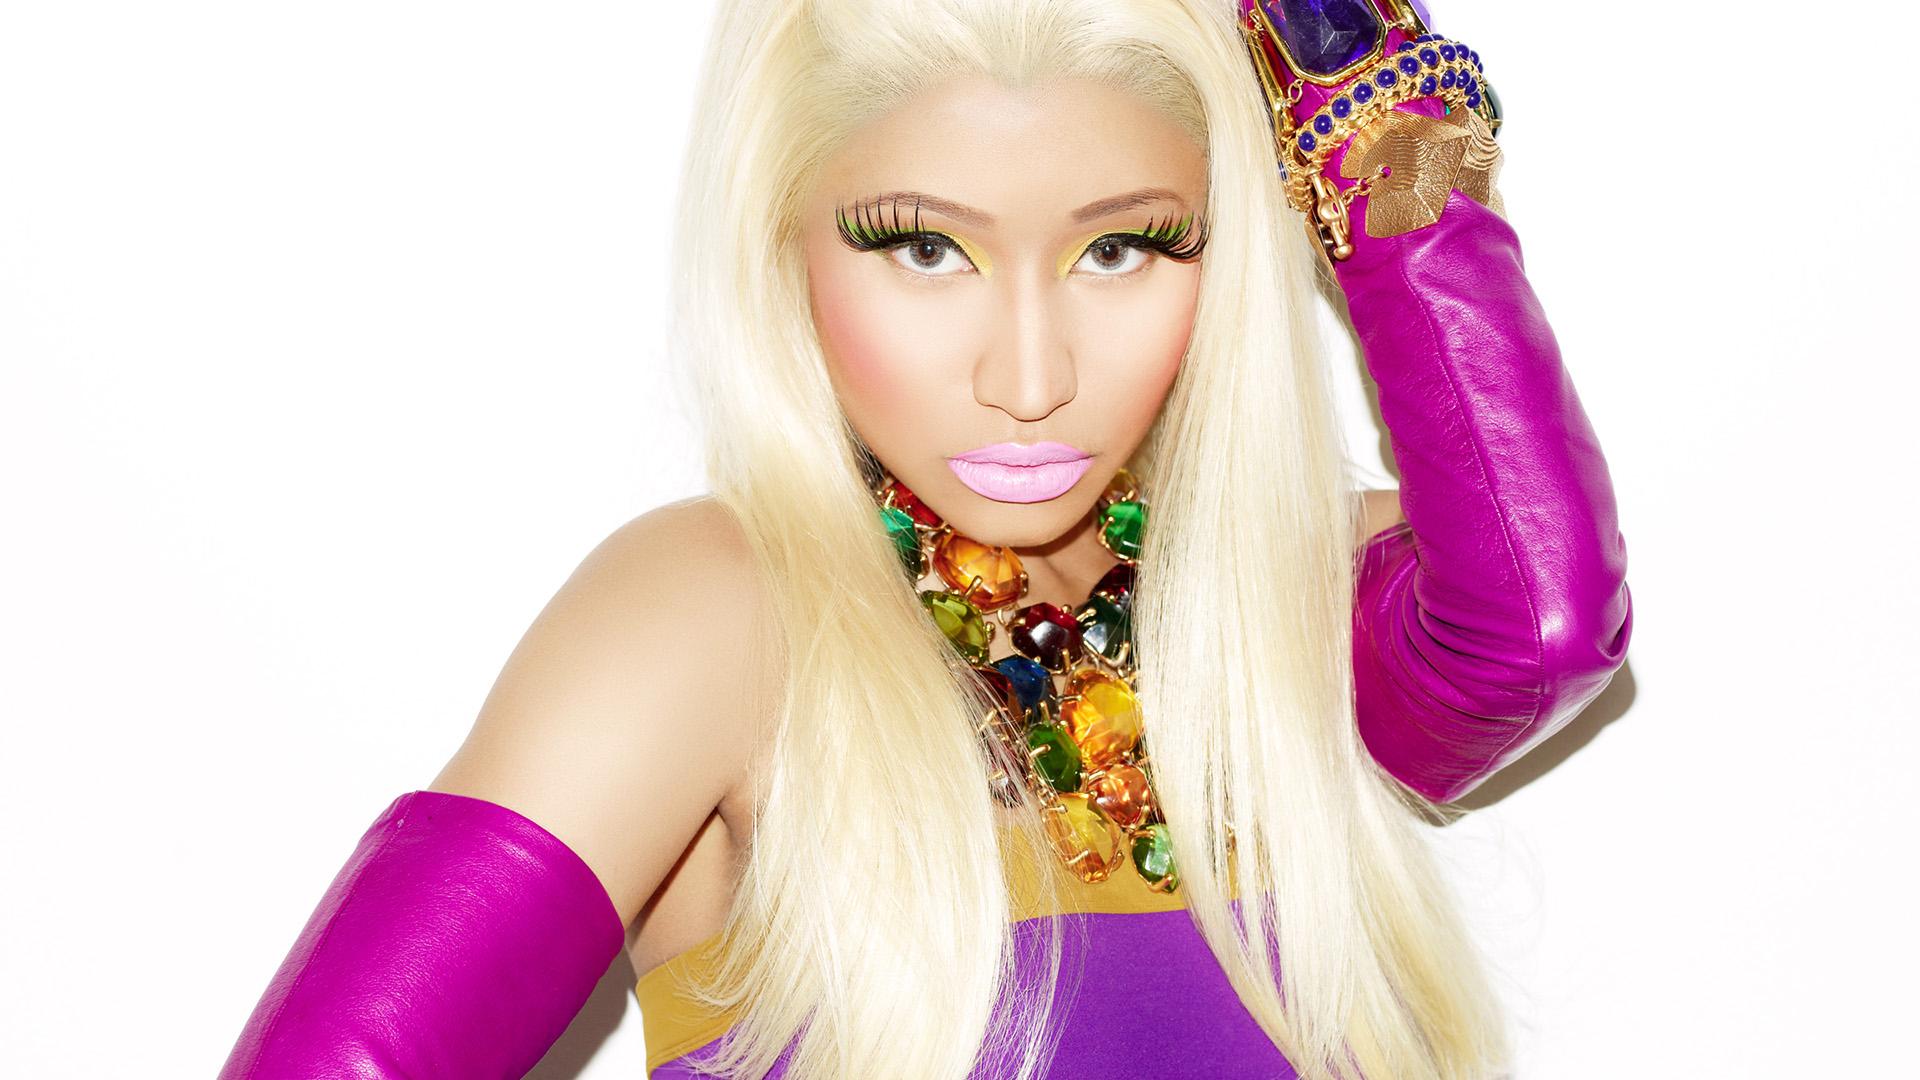 Nicki Minaj Wallpaper For